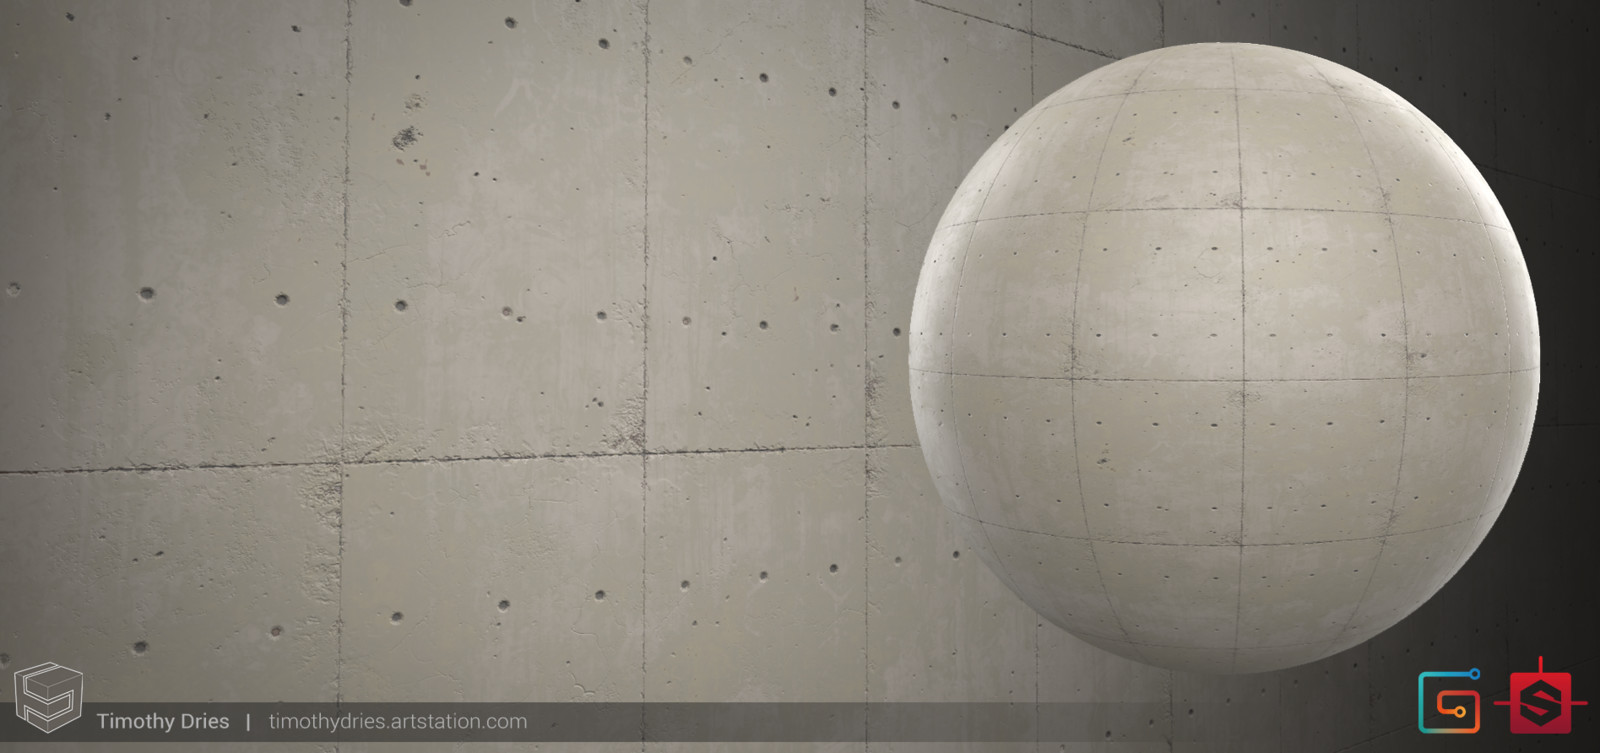 Concrete Slab - Available on Gumroad https://gum.co/DgucW